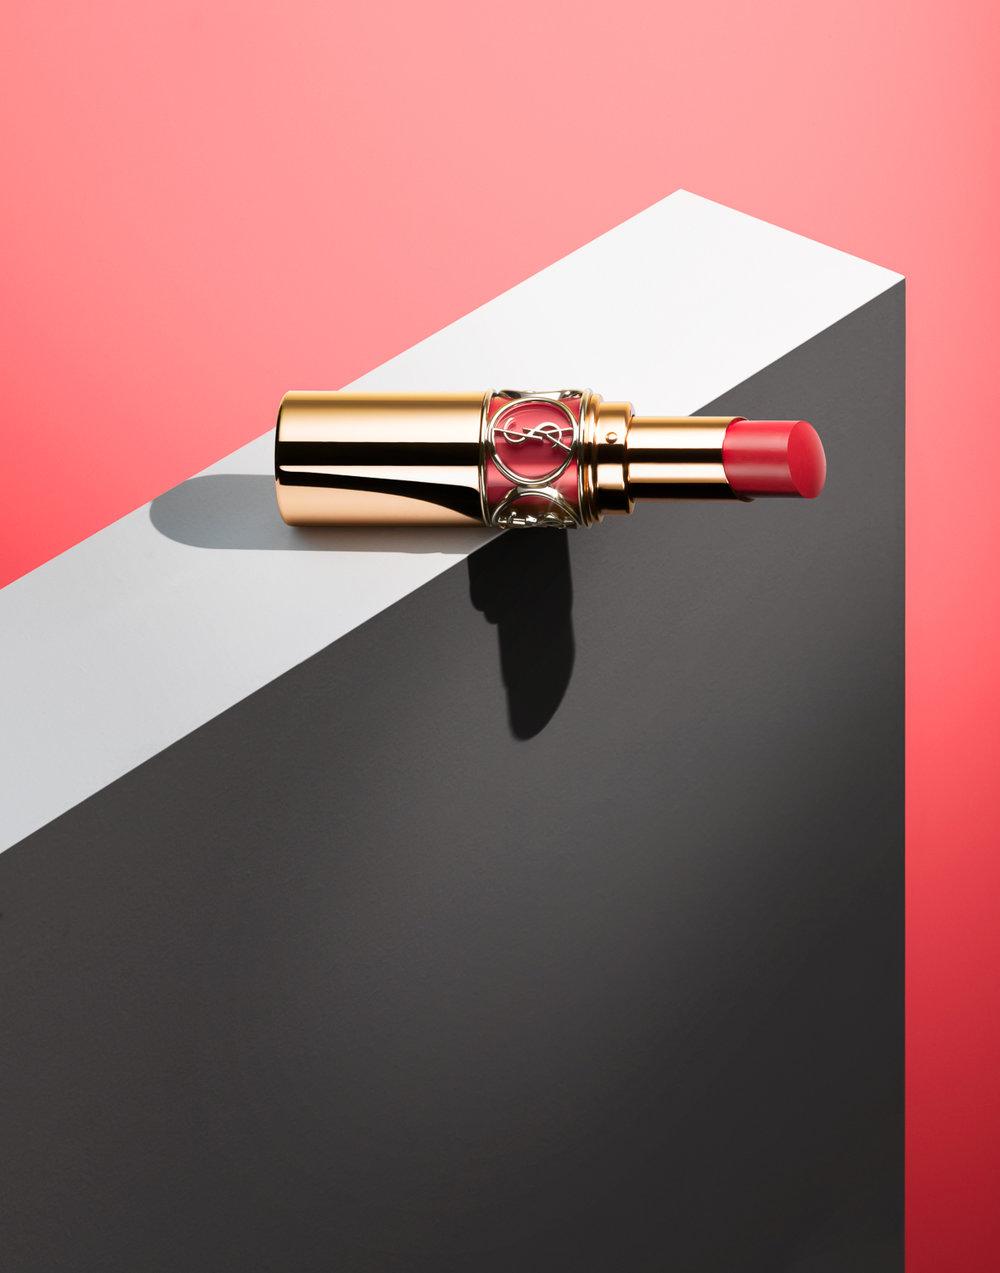 130903 P Cosmetics YSL Lipstick.jpg